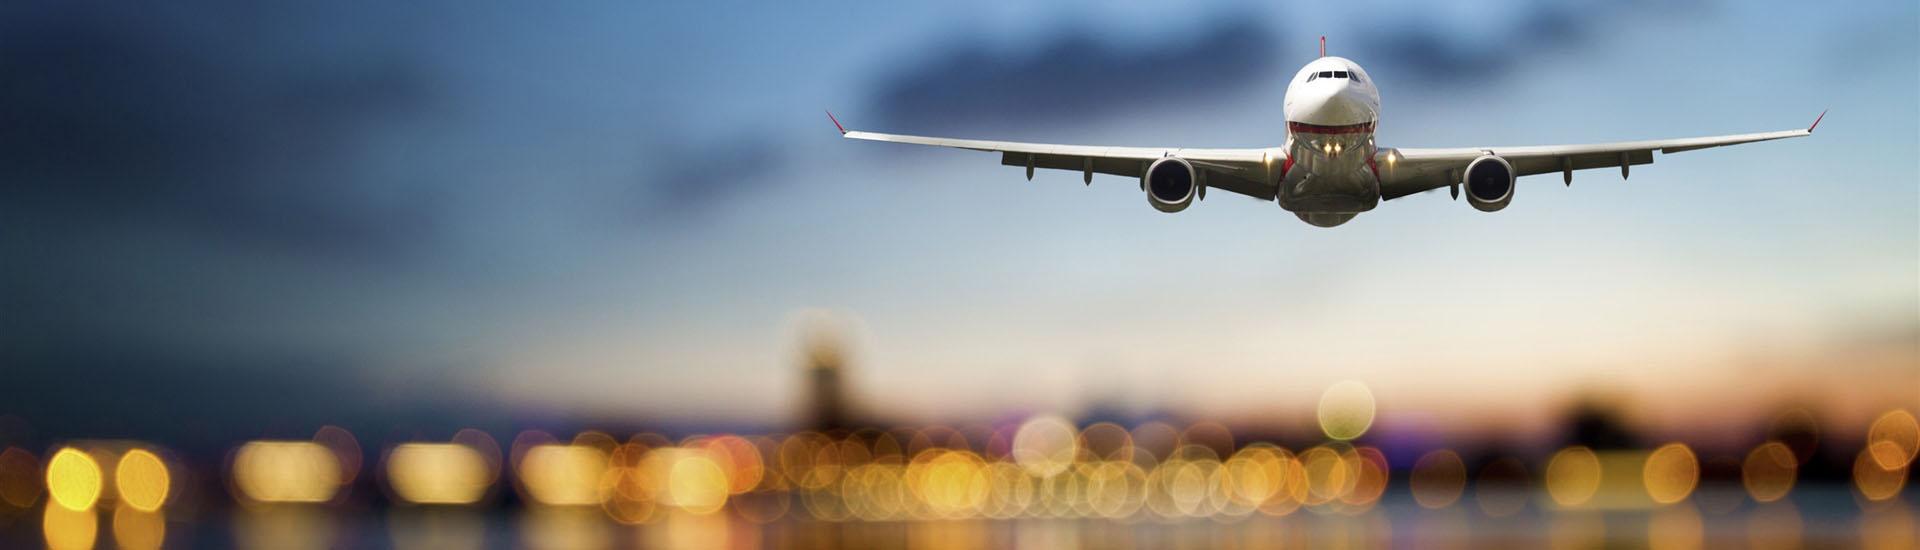 航空涡轮动力